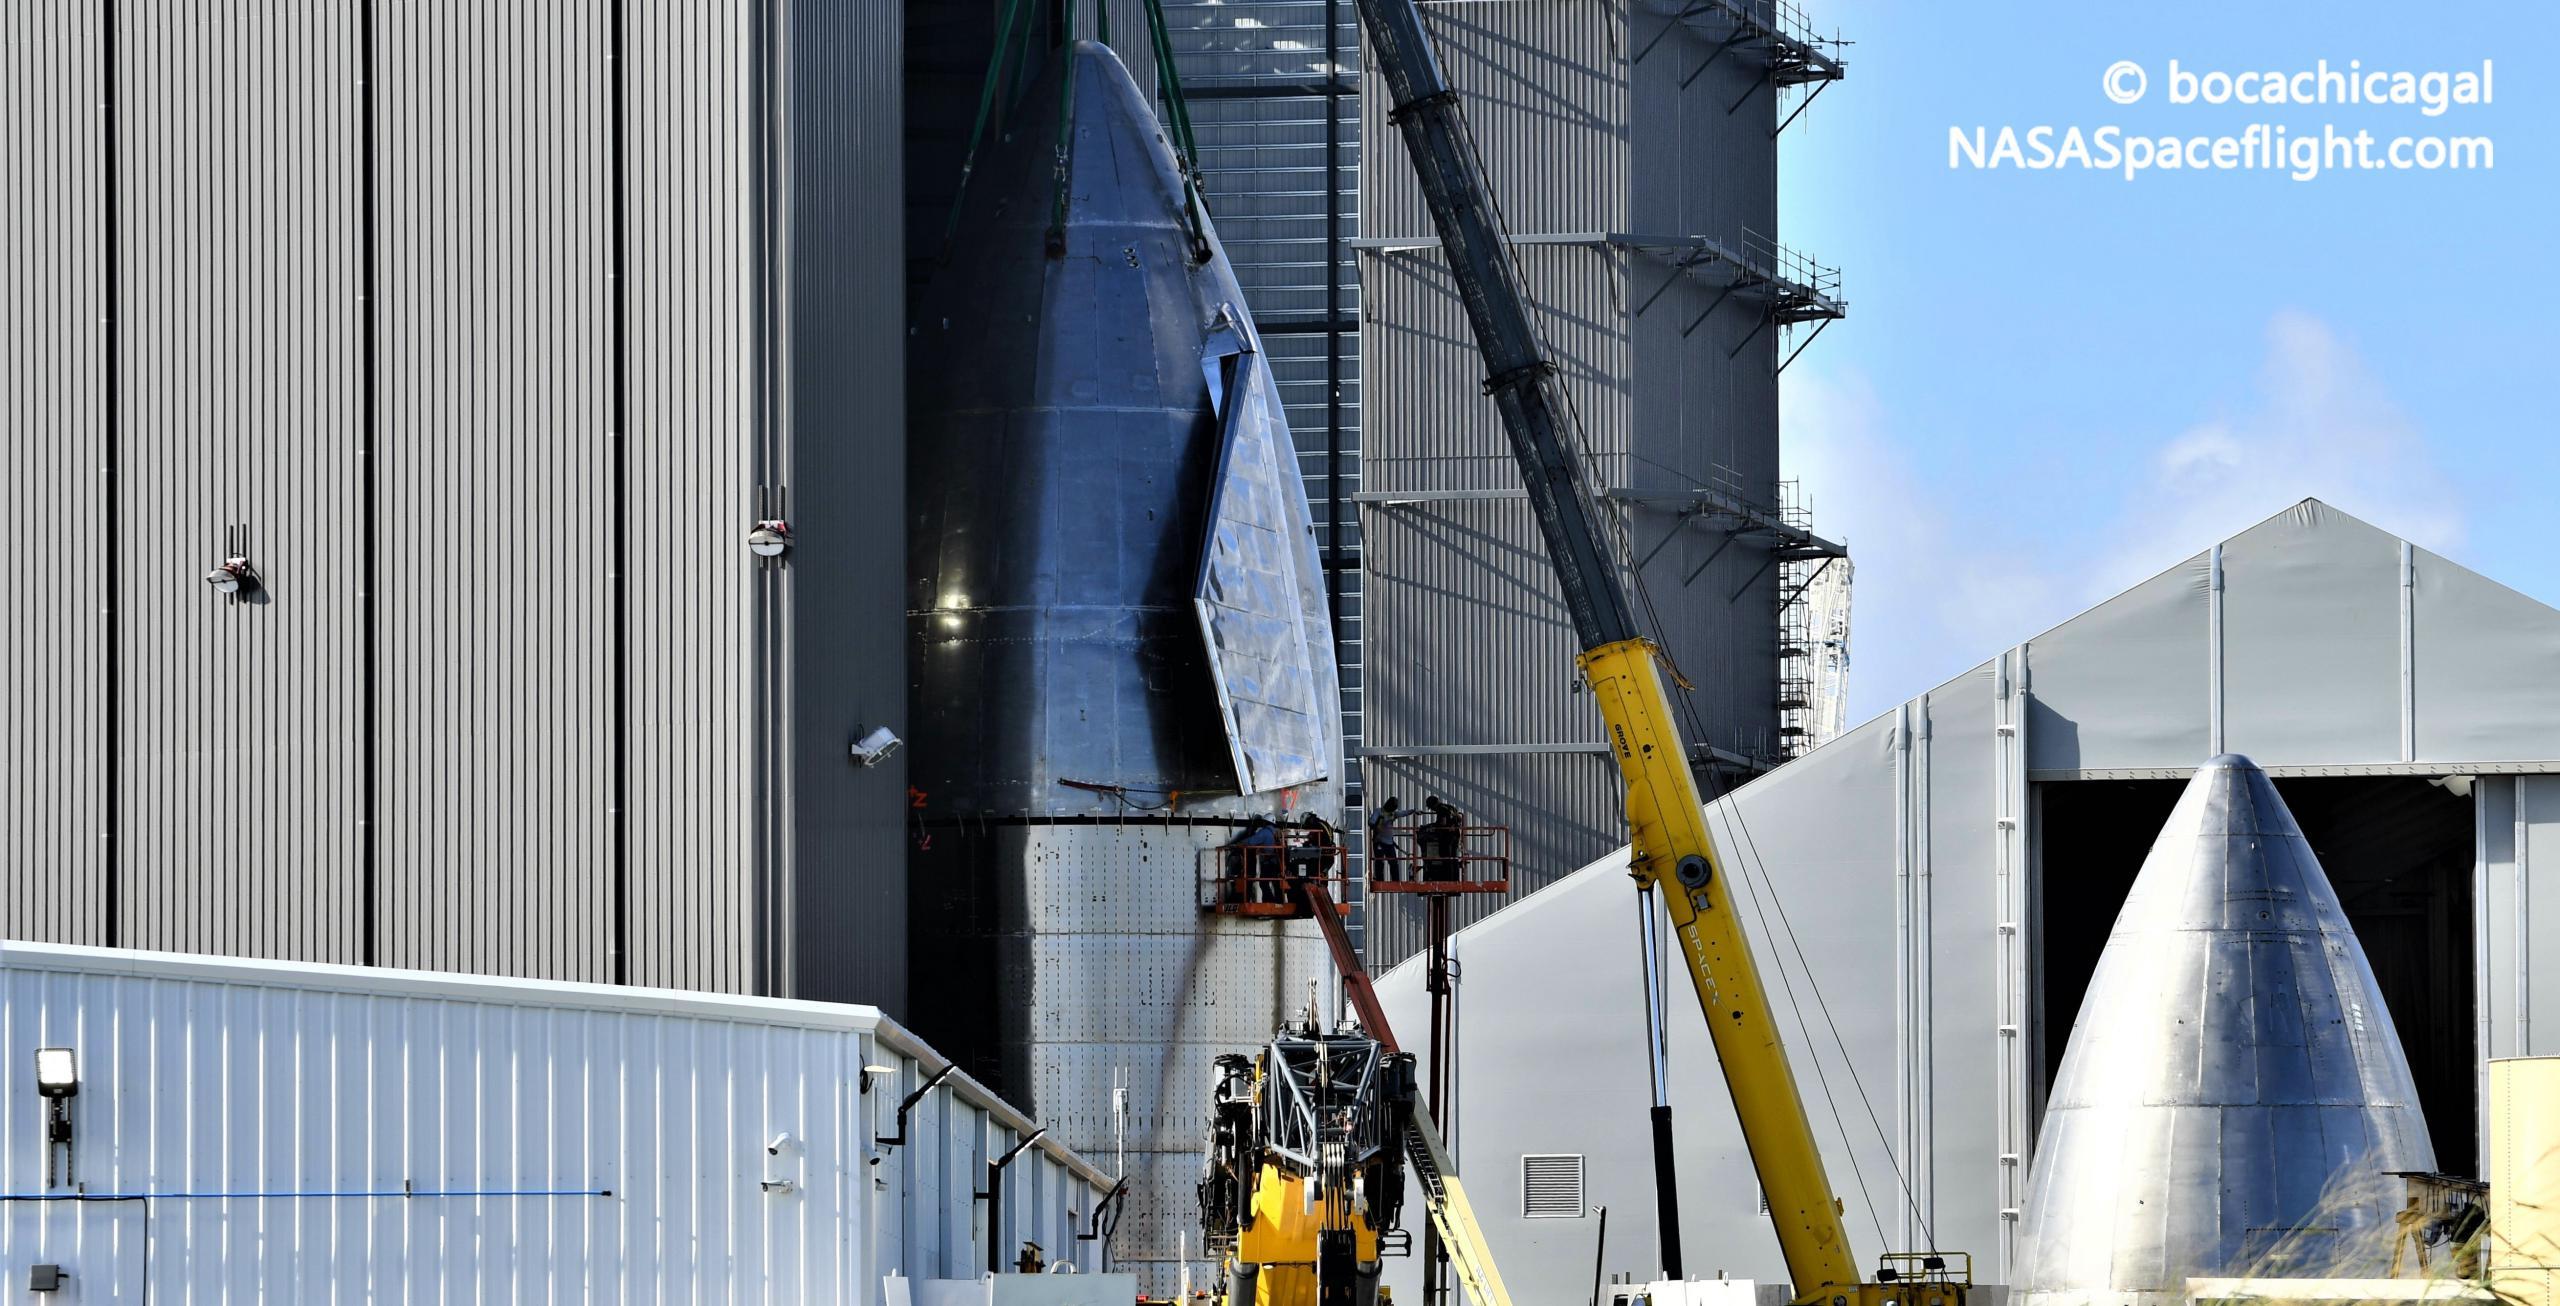 Starship Boca Chica 101920 (NASASpaceflight – bocachicagal) SN8 nosecone stack 4 crop (c)